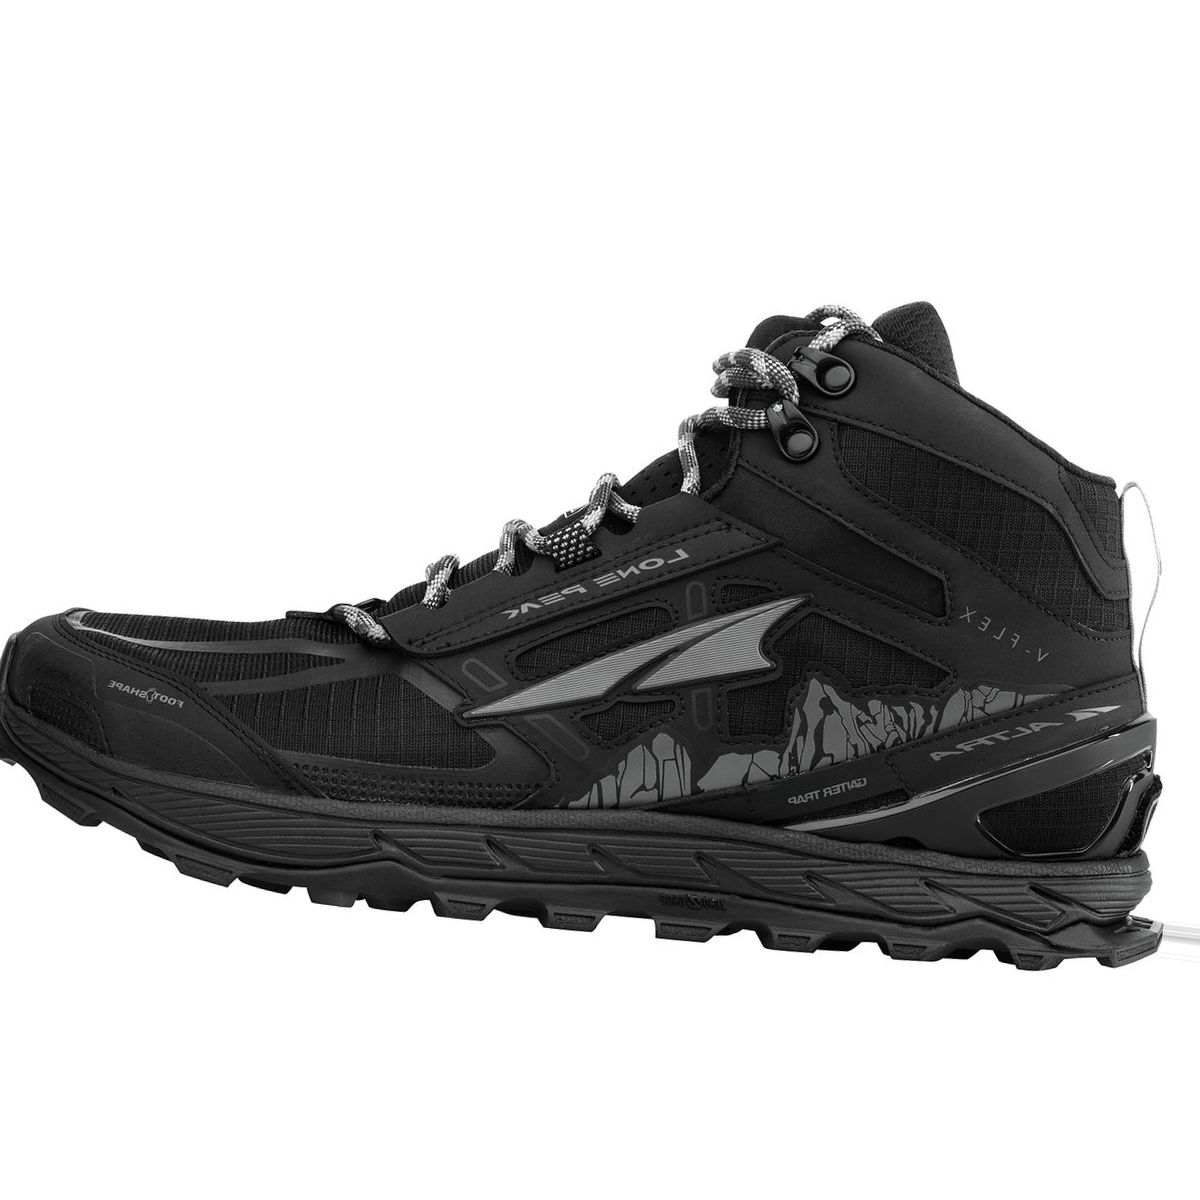 Altra Lone Peak 4 Mid Mesh Trail Running Shoe - Men's